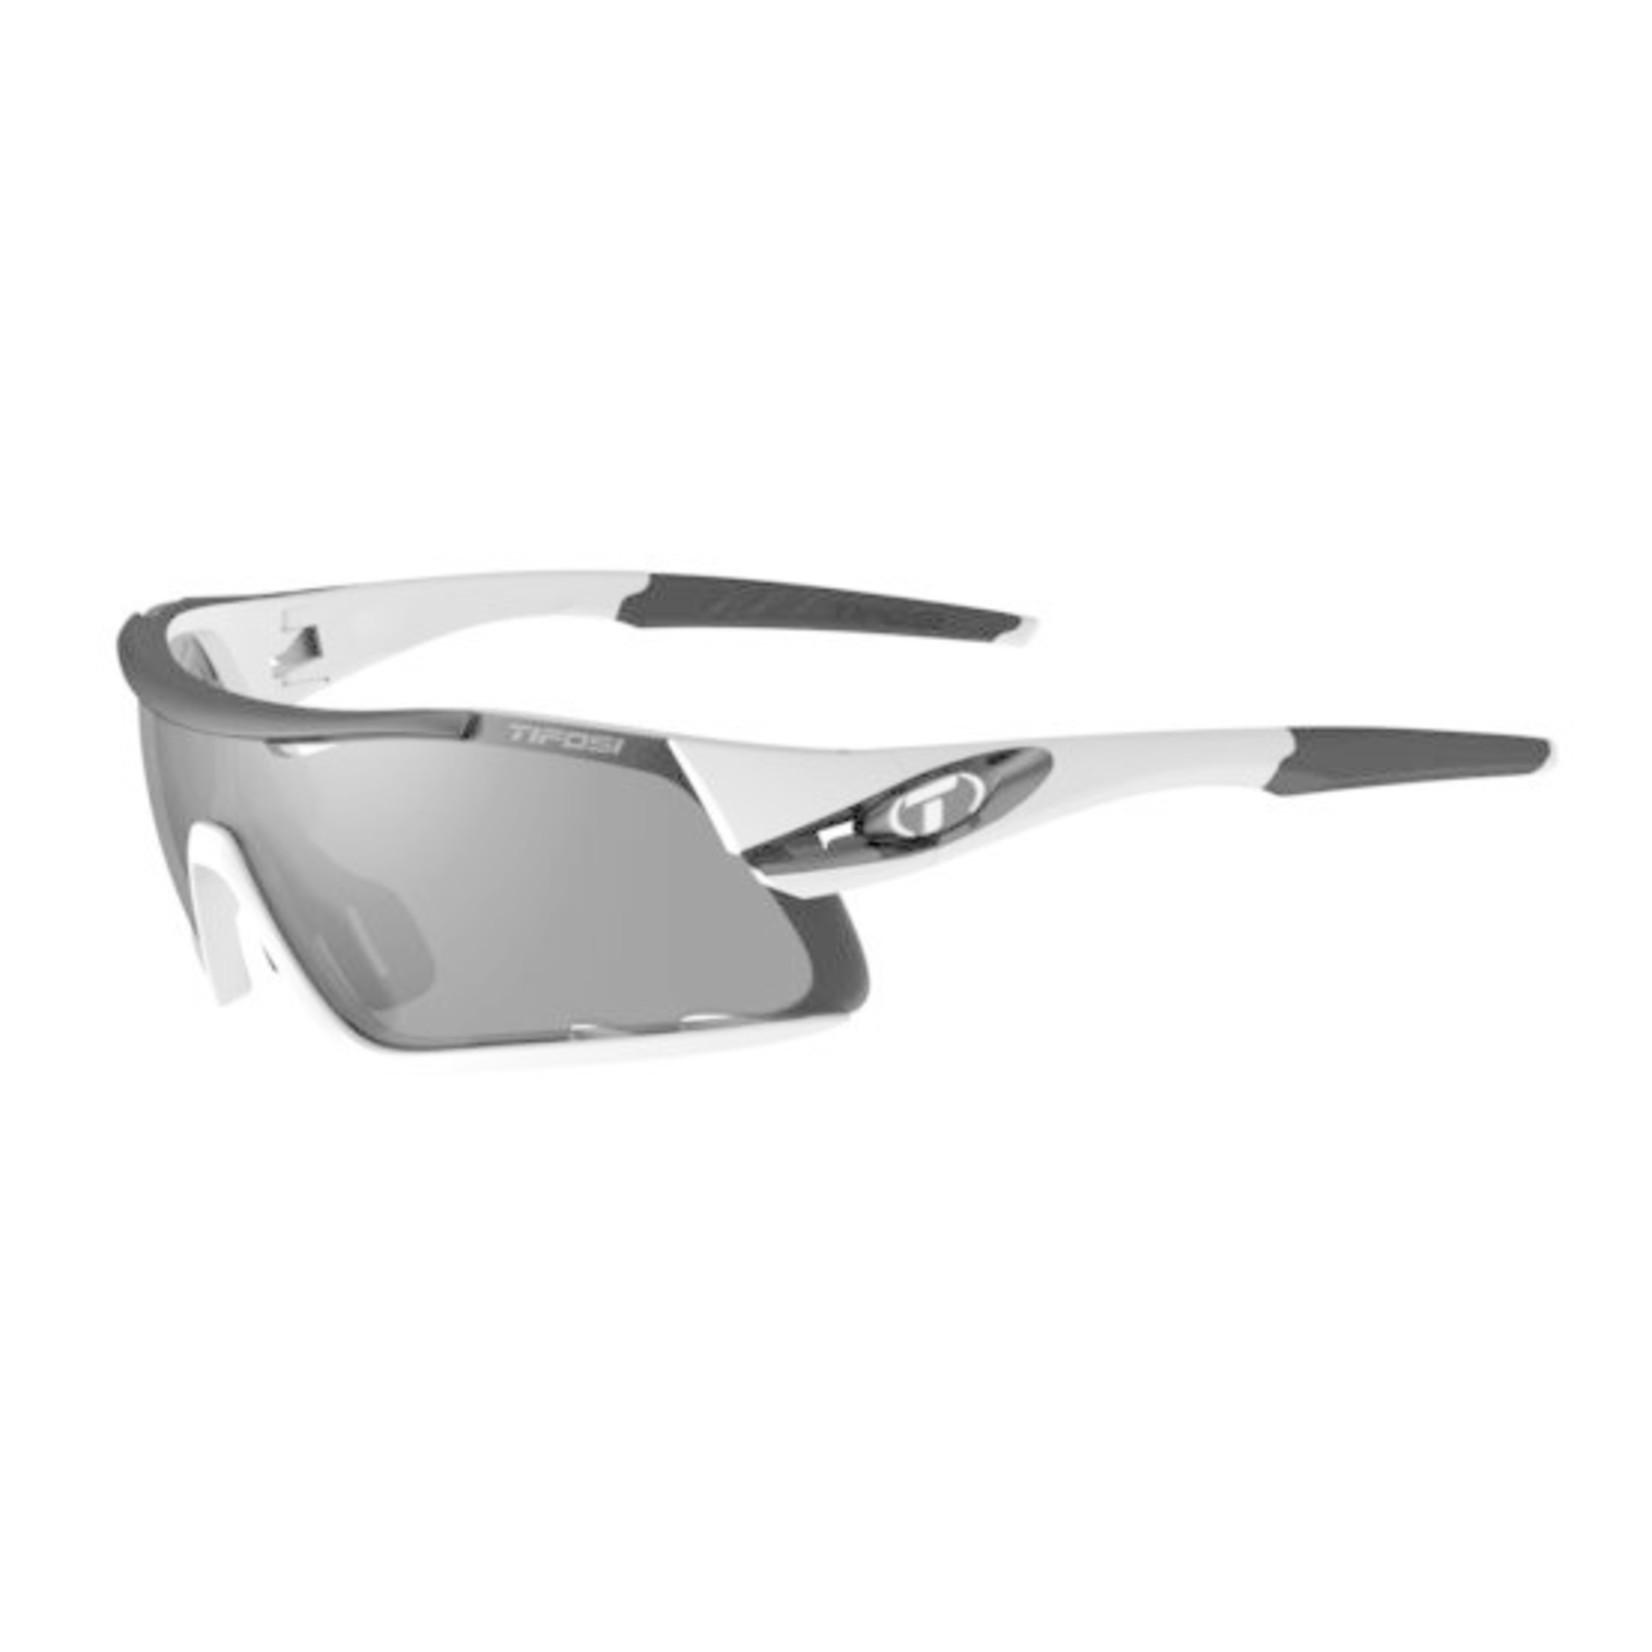 Tifosi Optics Davos, White/Black Interchangeable Sunglasses